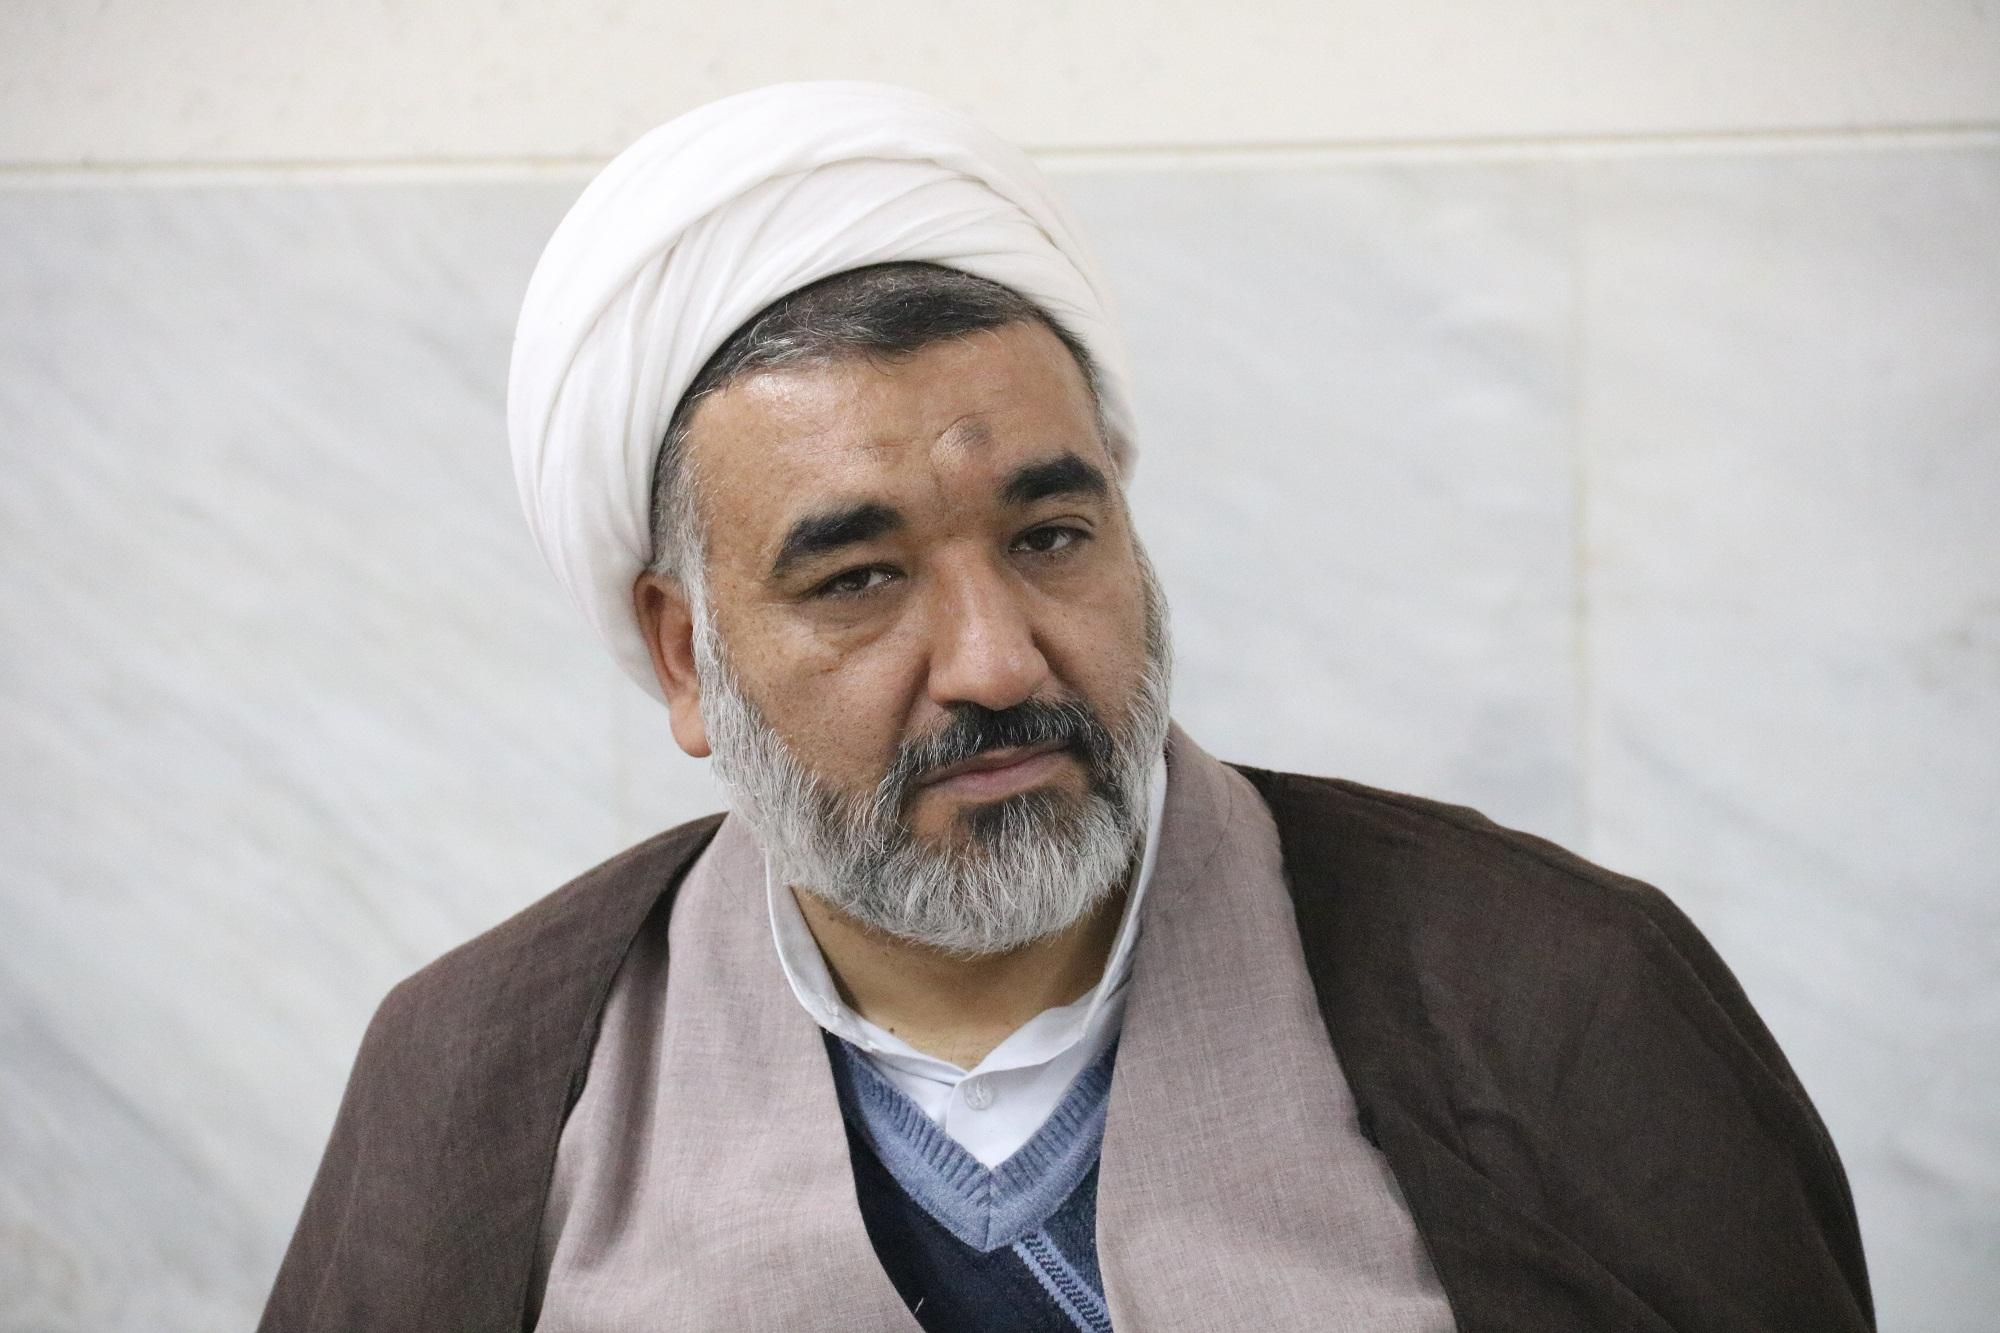 حجت الاسلام محمدرضا اسماعیل پور اوقاف بوشهر